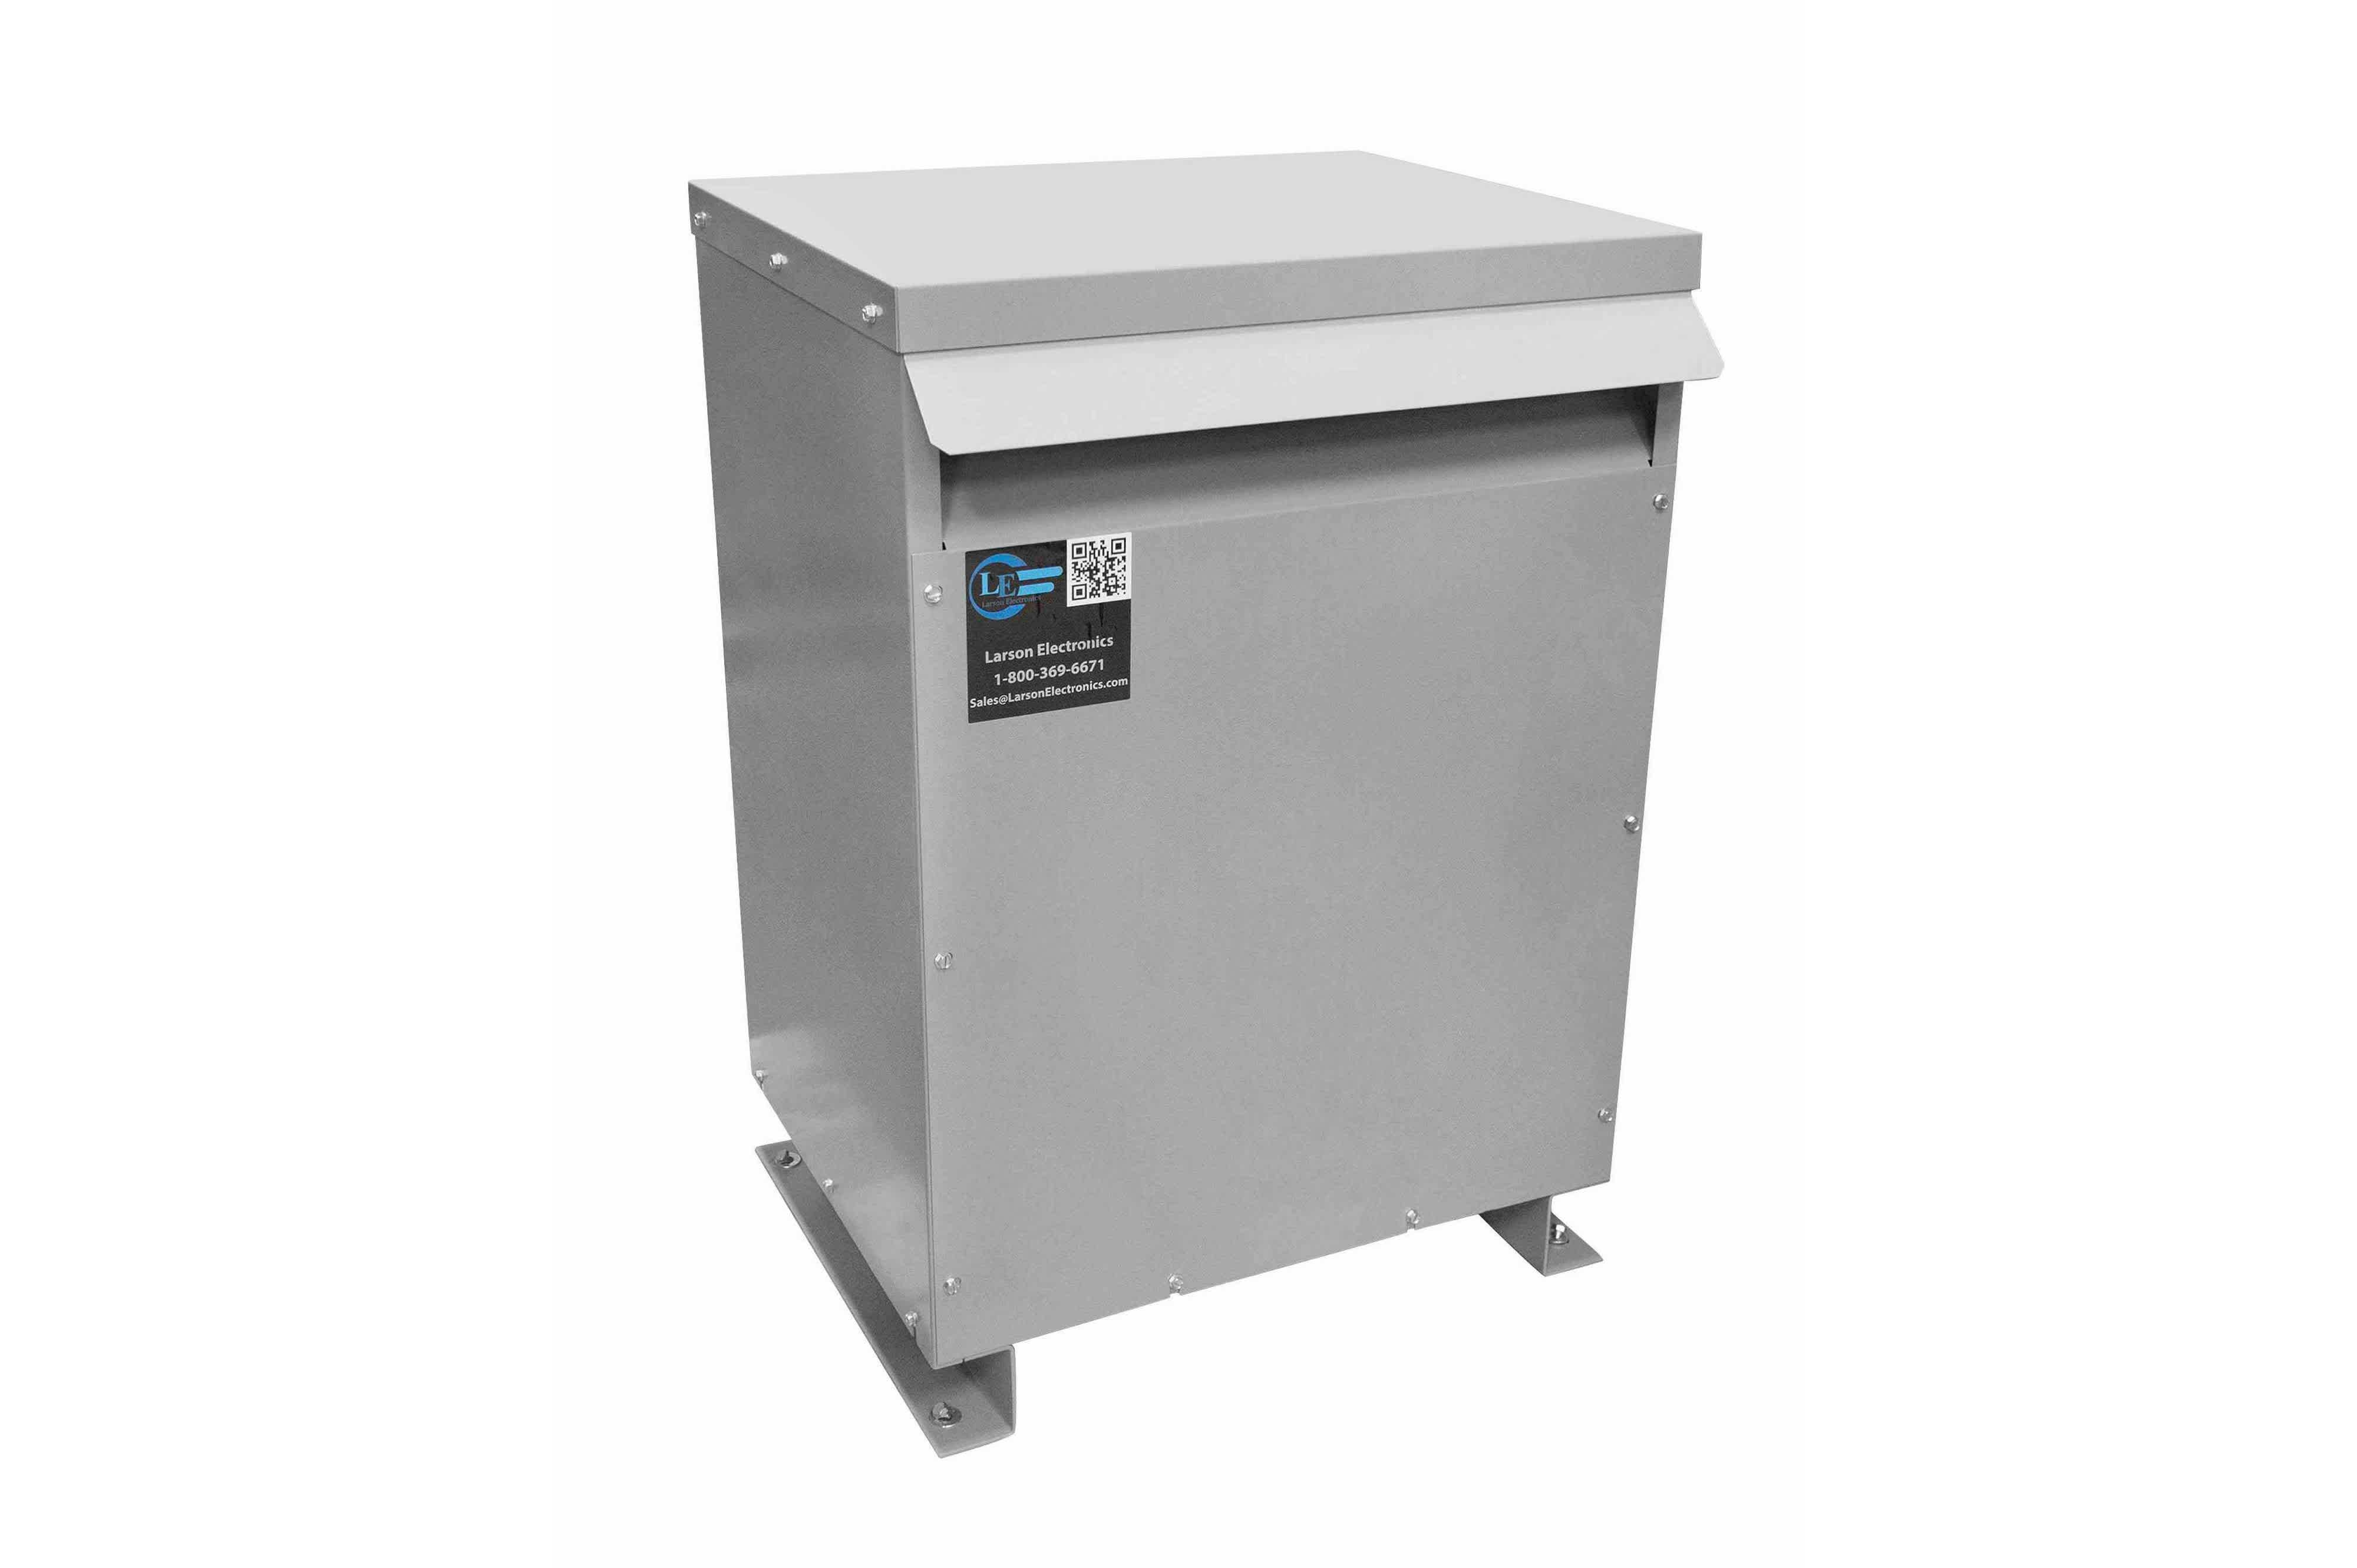 900 kVA 3PH Isolation Transformer, 460V Wye Primary, 600V Delta Secondary, N3R, Ventilated, 60 Hz